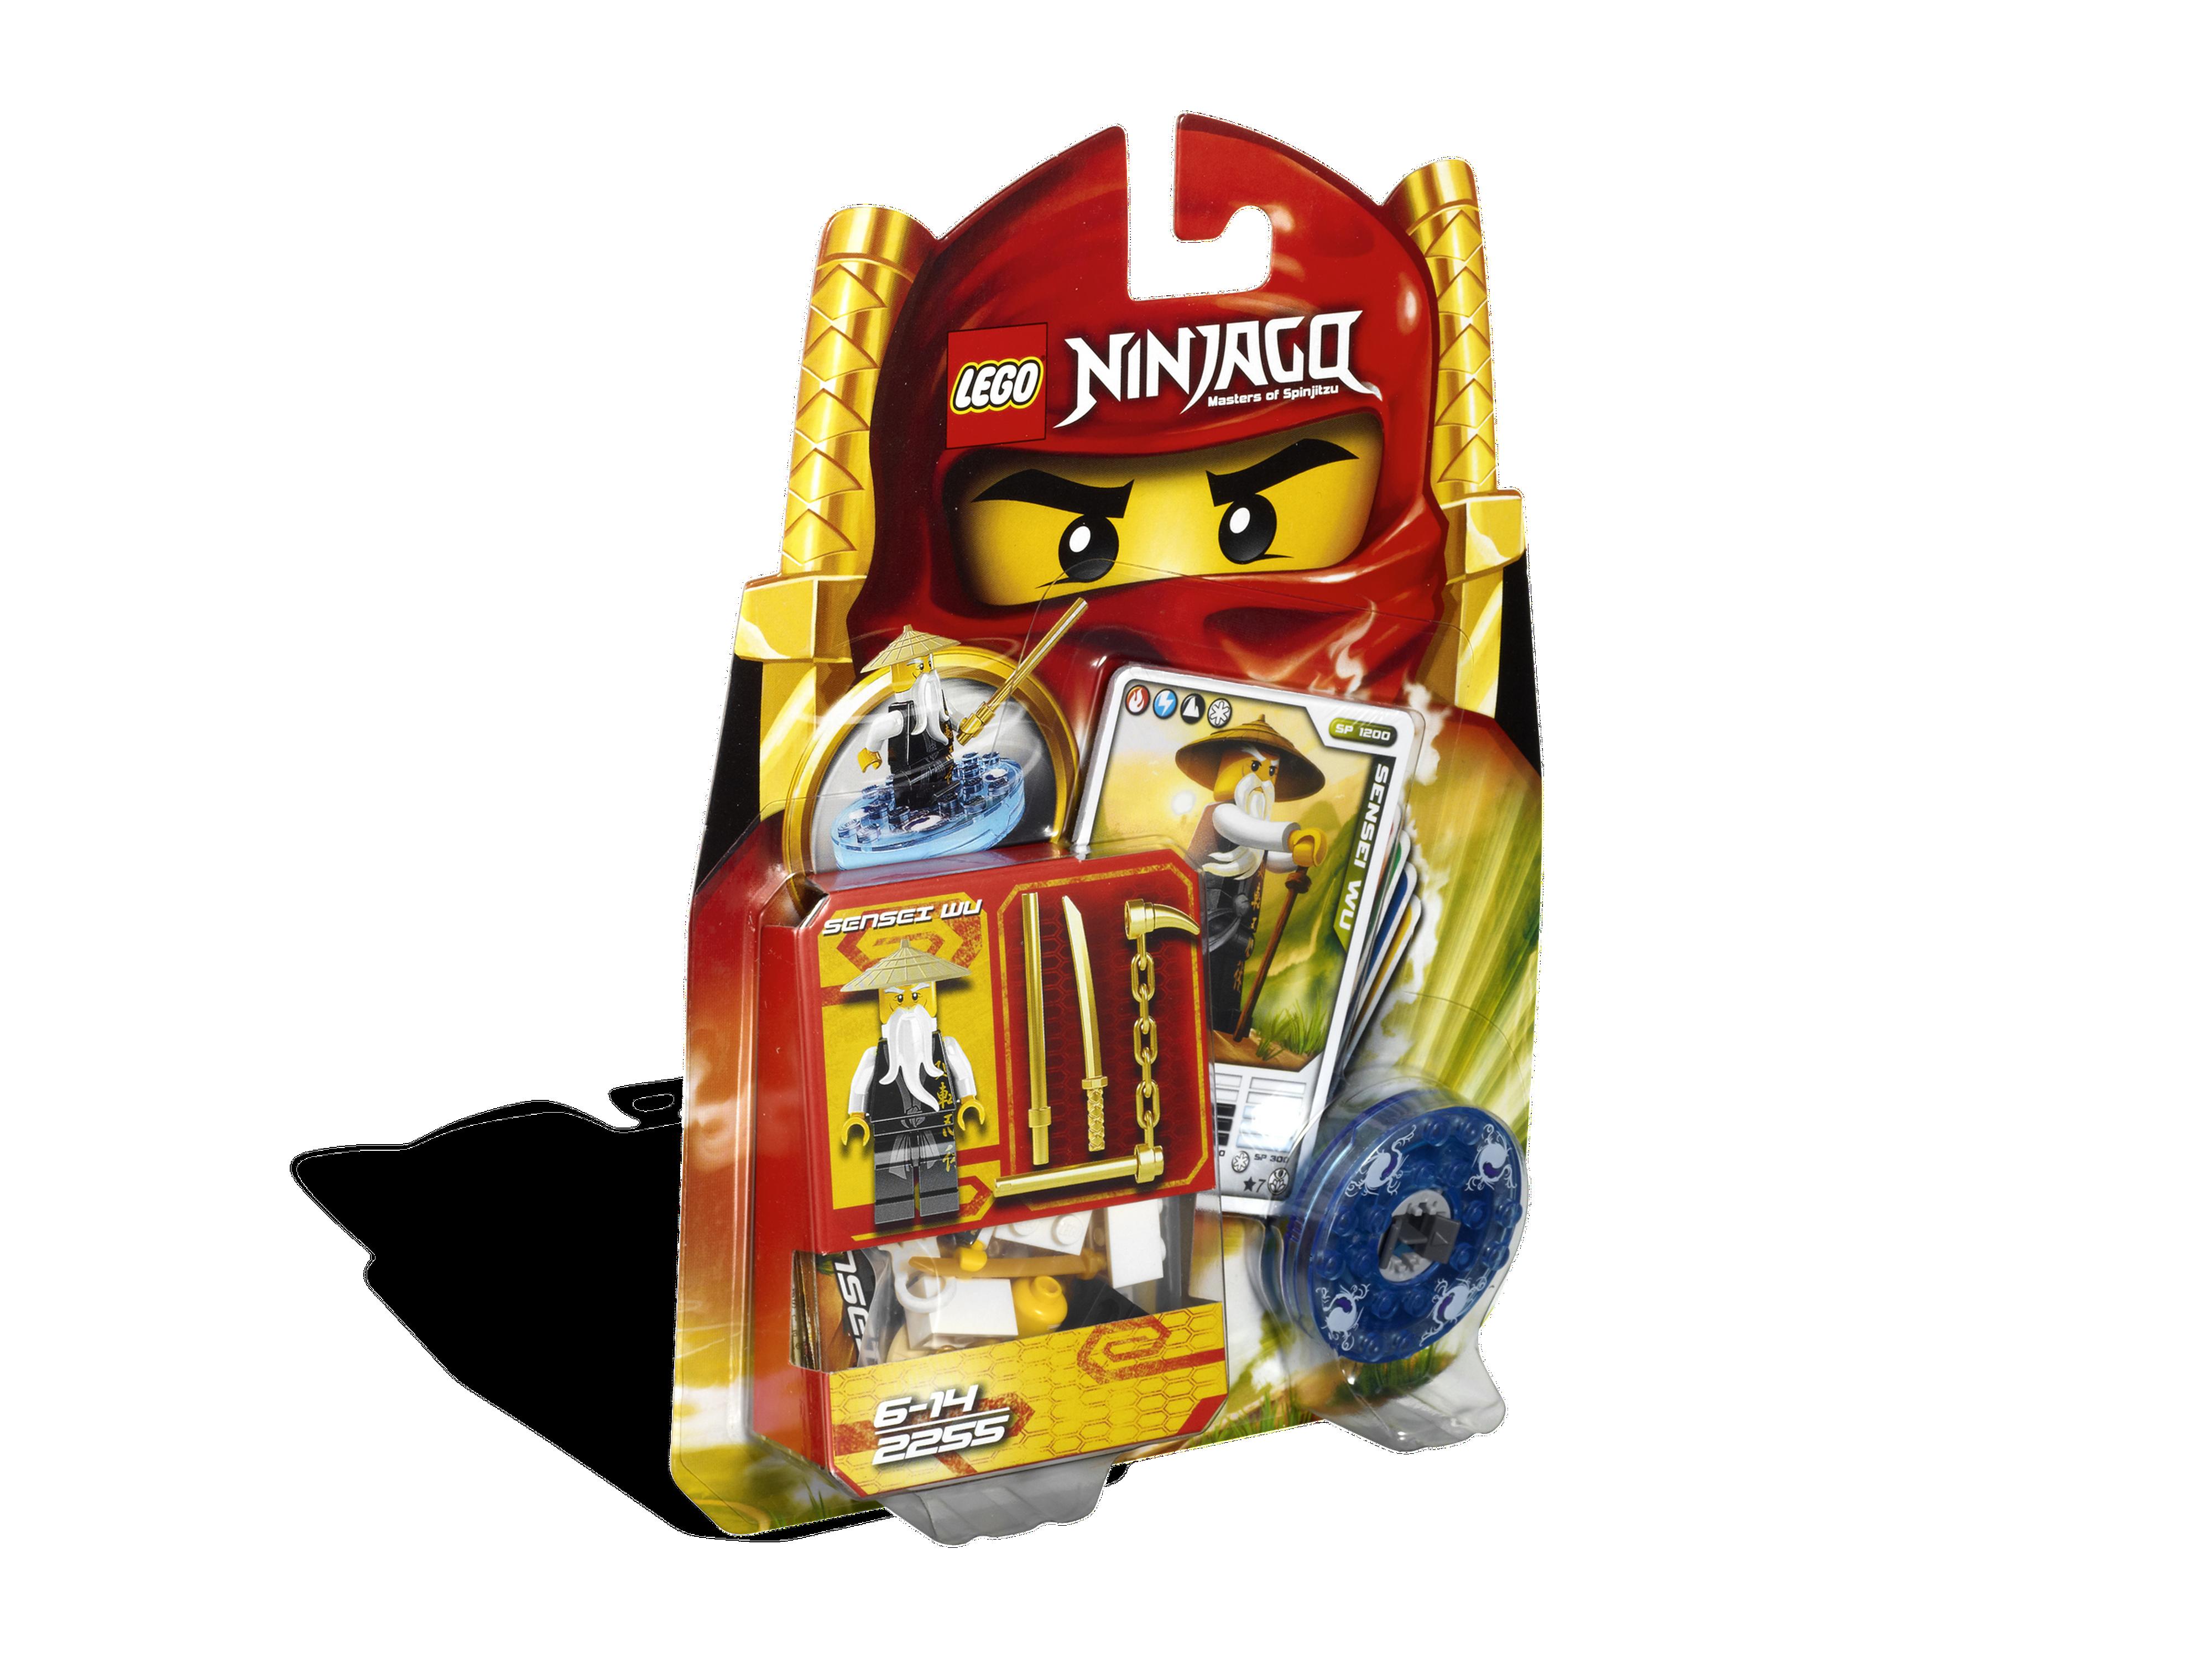 2255 sensei wu brickipedia the lego wiki - Sensei ninjago ...